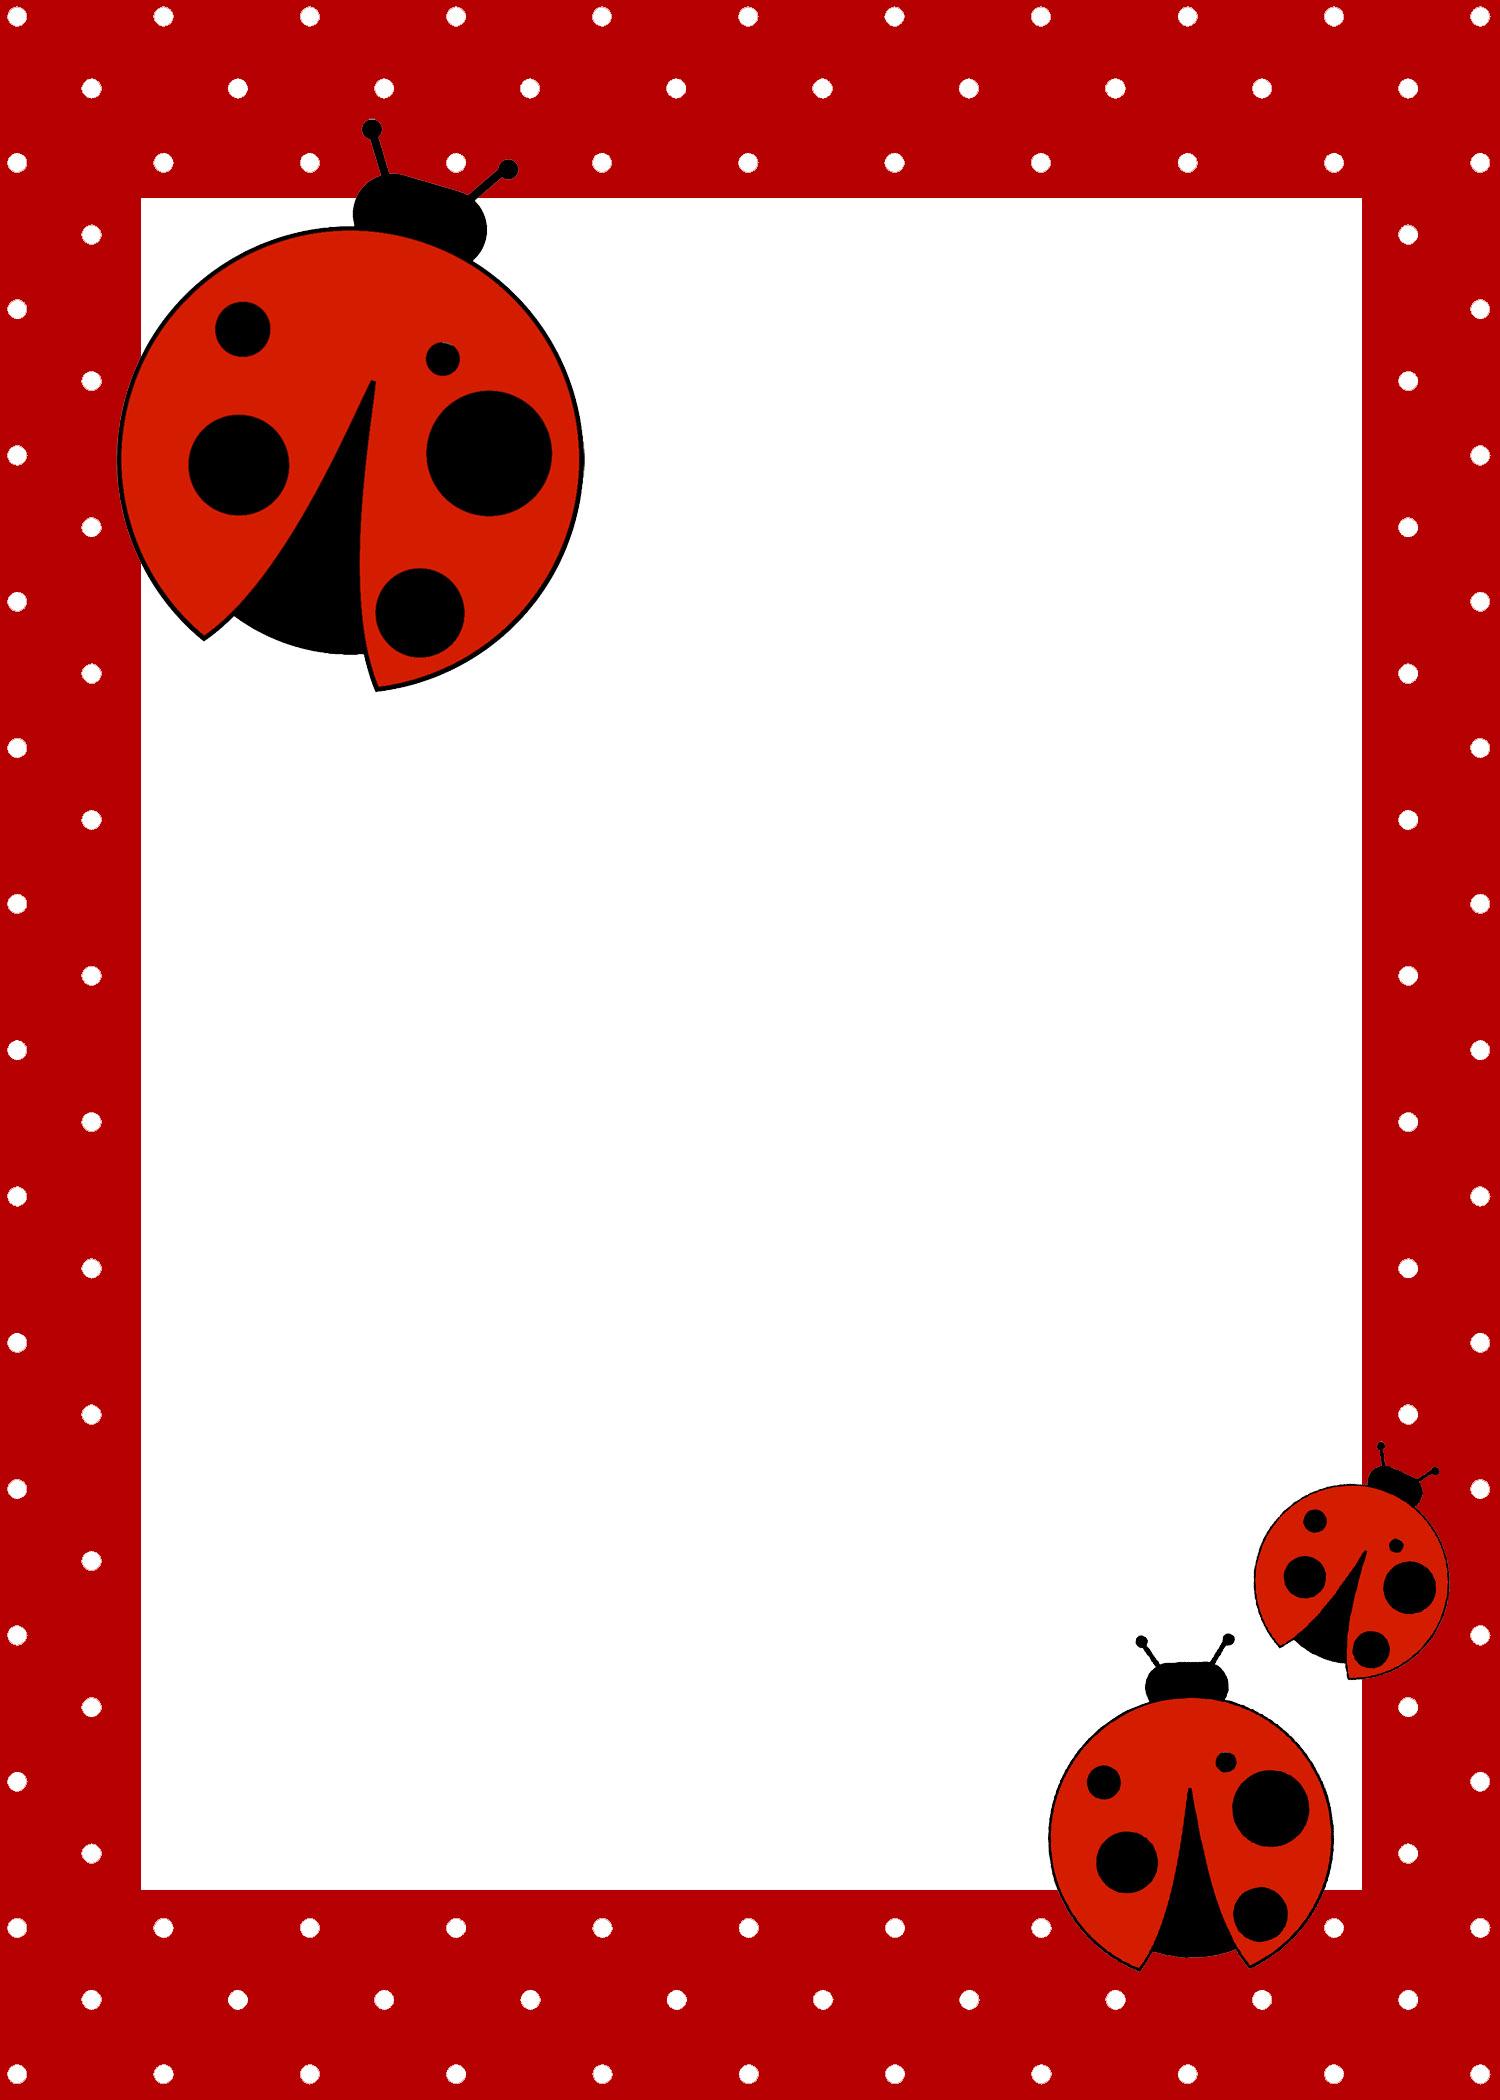 Ladybug Birthday Party With Free Printables - How To Nest For Less™ - Free Printable Ladybug Baby Shower Invitations Templates